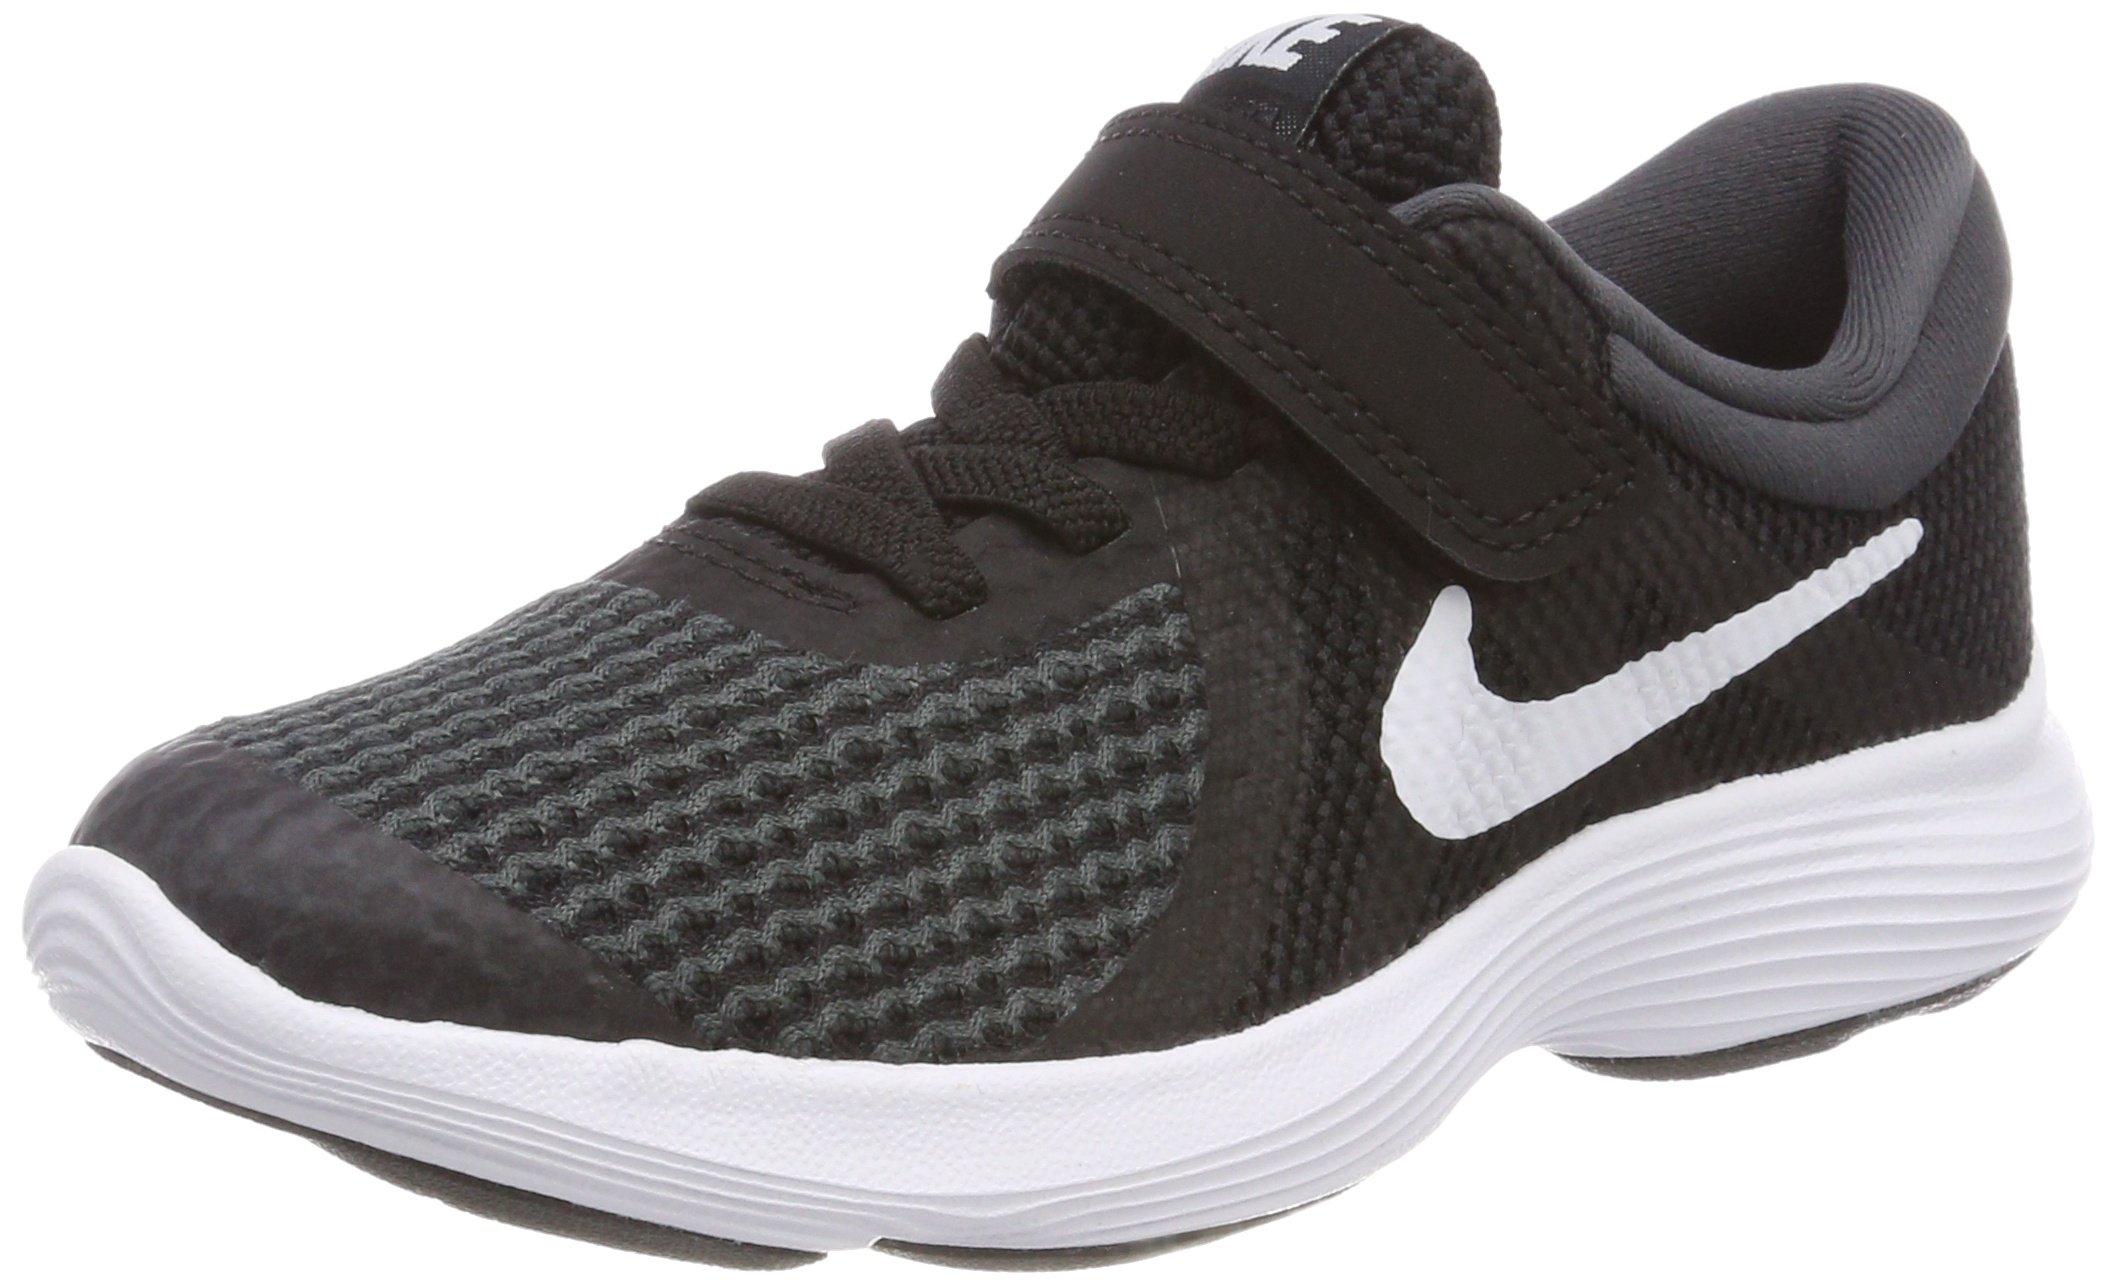 Nike Boys' Revolution 4 (PSV) Running Shoe, Black/White-Anthracite, 11C Youth US Little Kid by Nike